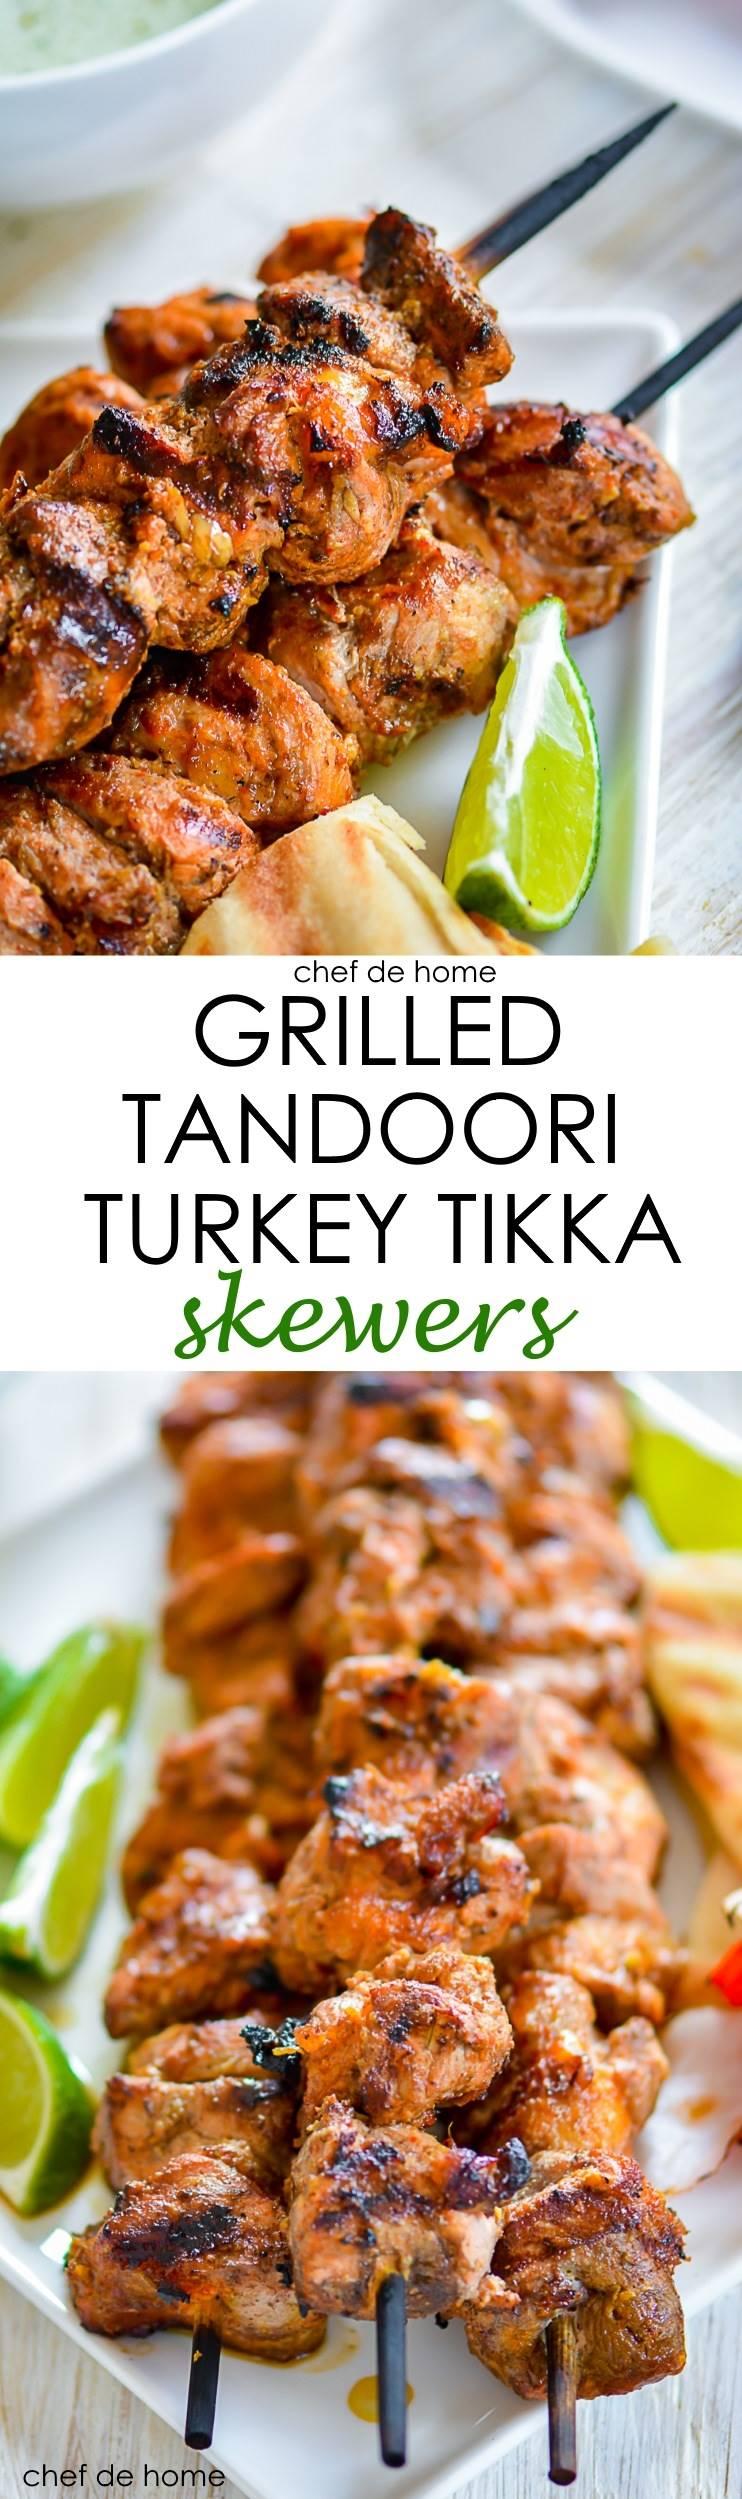 Grilled tandoori turkey breast with indian tikka masala flavors | chefdehome.com